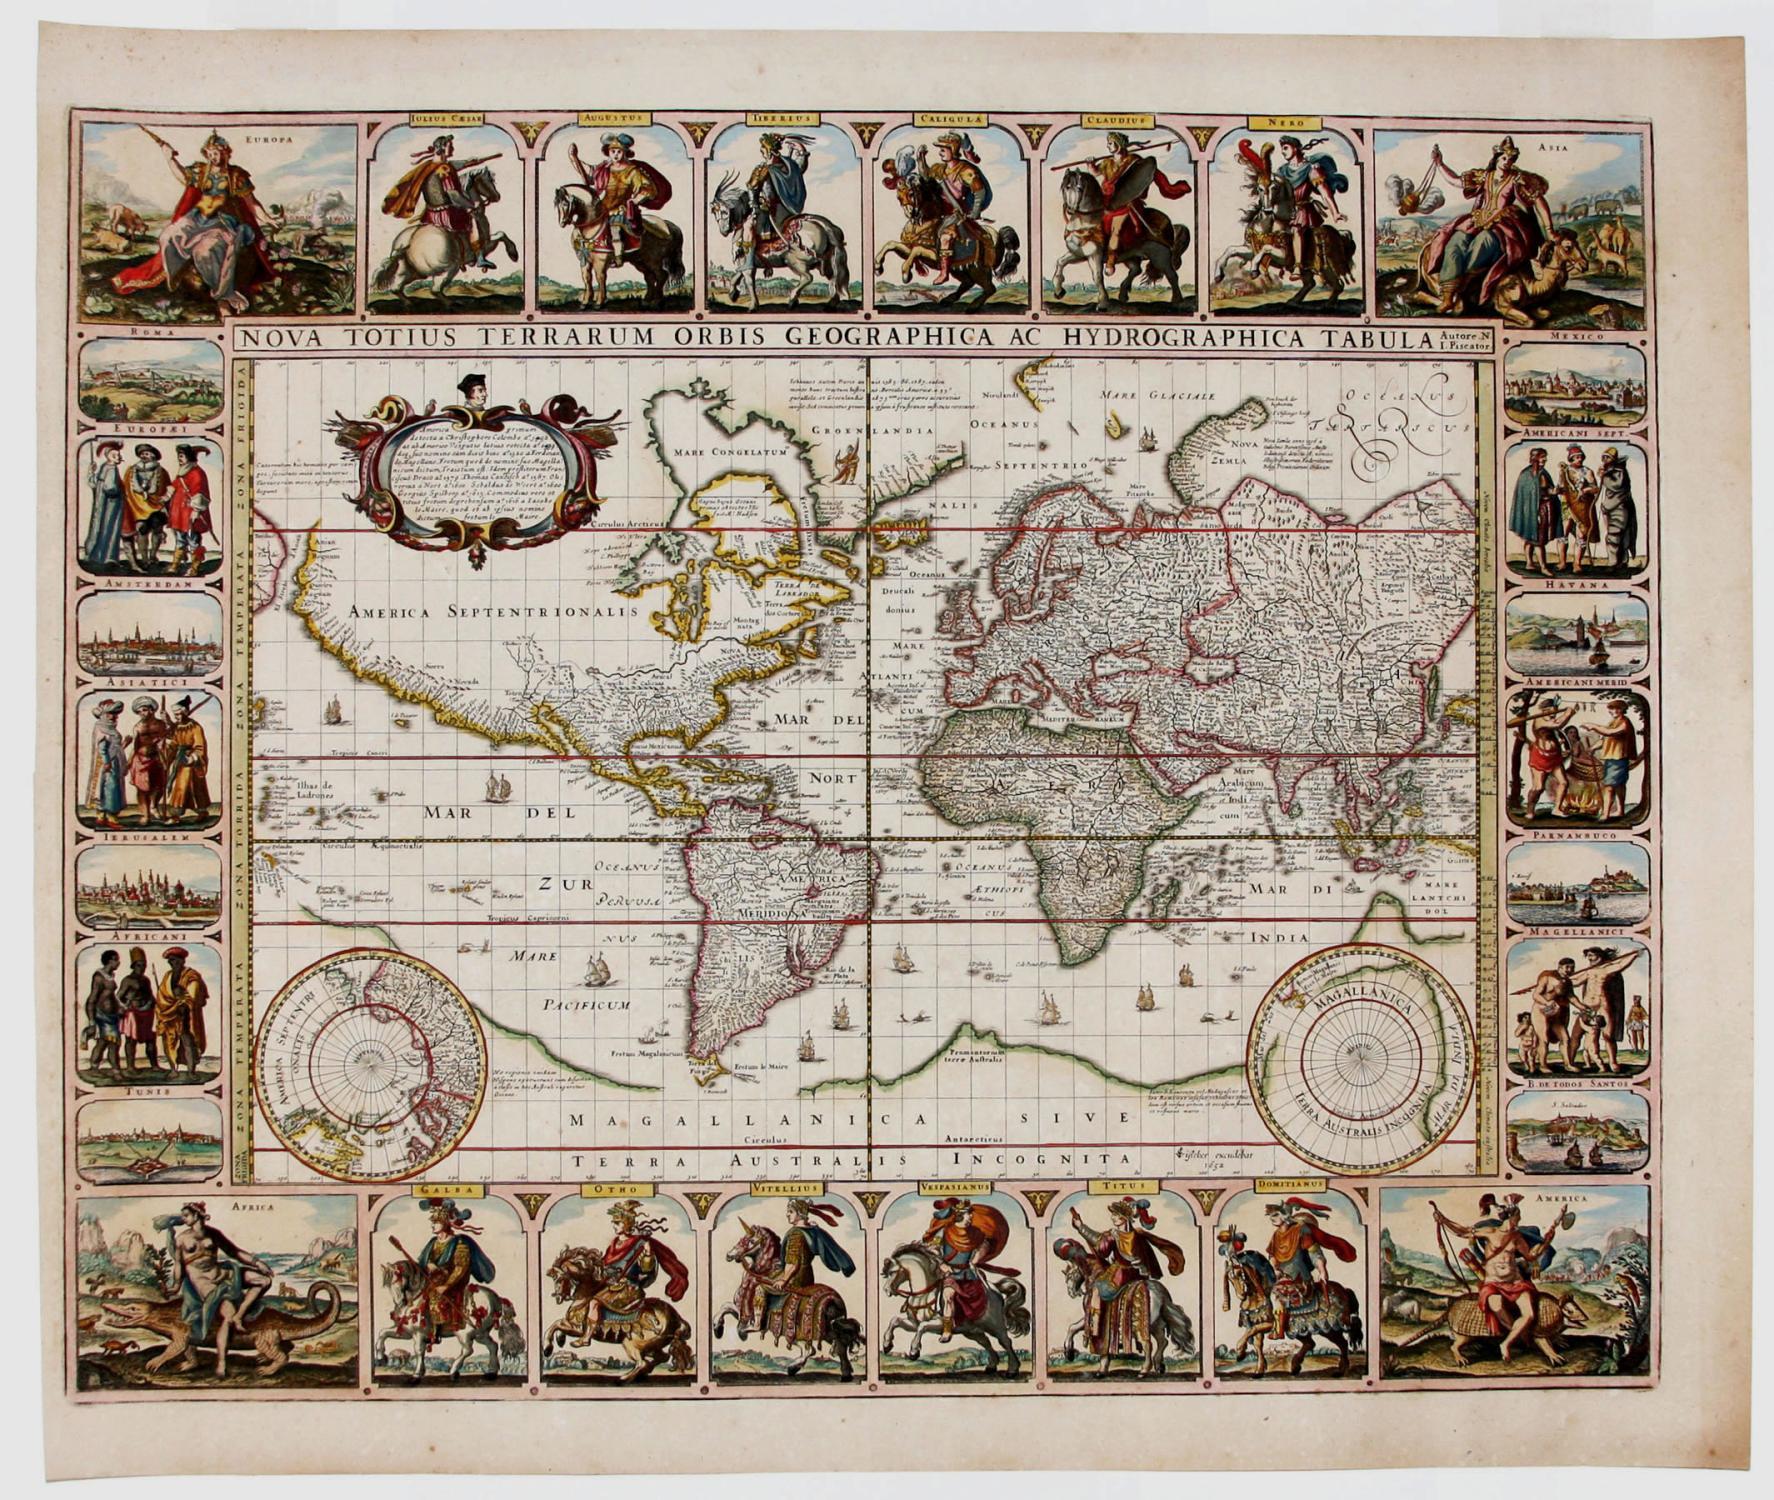 Nova Totius Terrarum Orbis Geographica Ac Hydrographica Tabula Autore. N. I. Piscator.: VISSCHER, C...